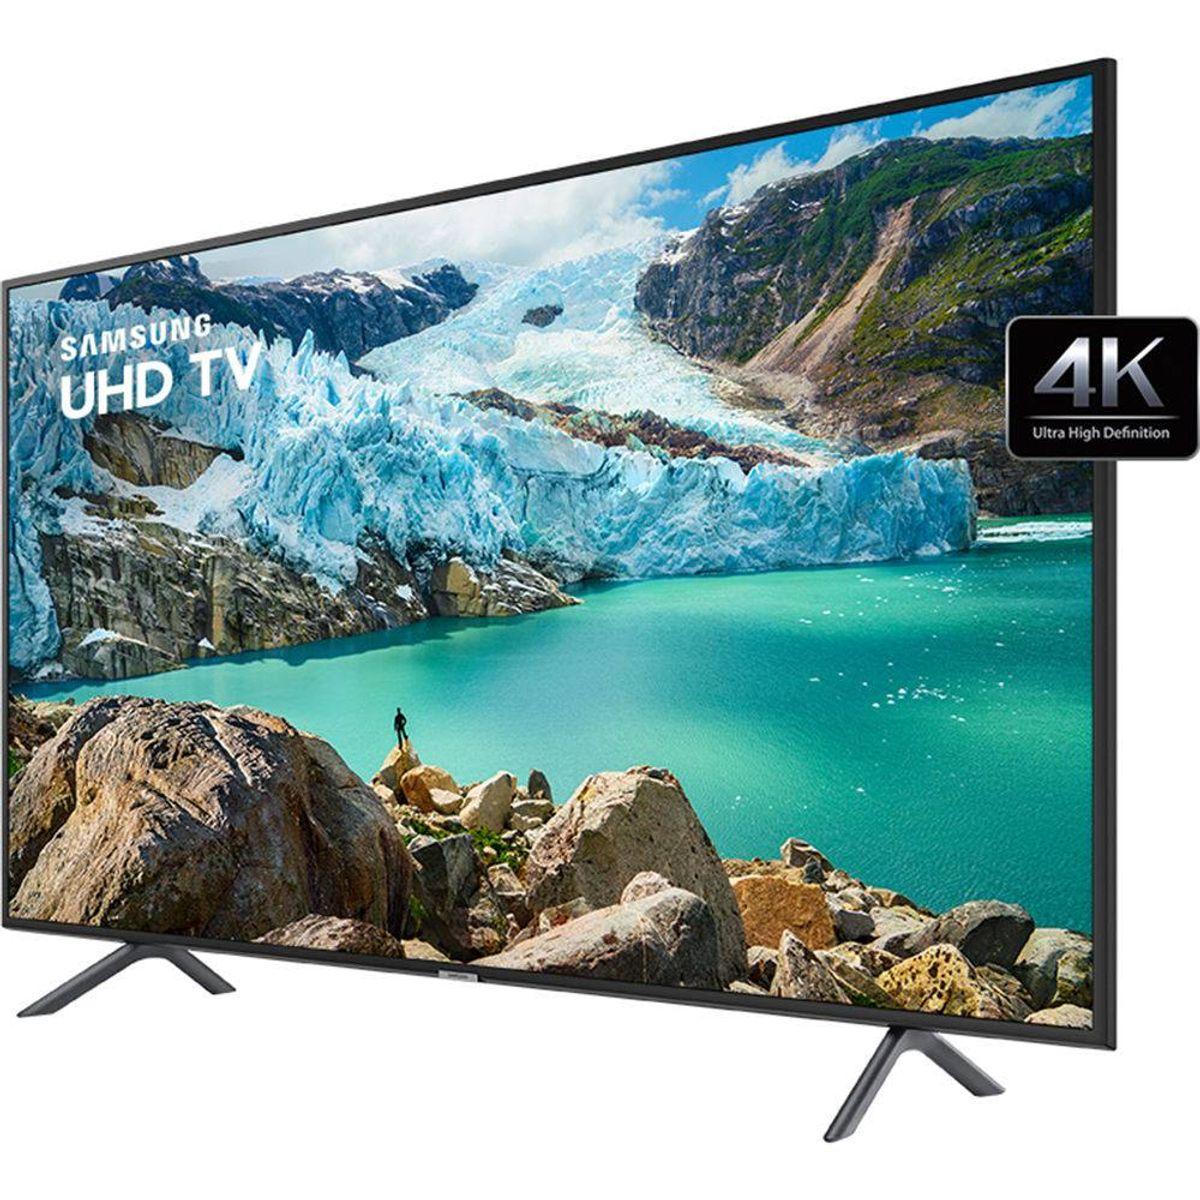 "Smart TV LED 65"" 4K Samsung 65RU7100 3 HDMI 2 USB Wi-Fi - lojaibyte"